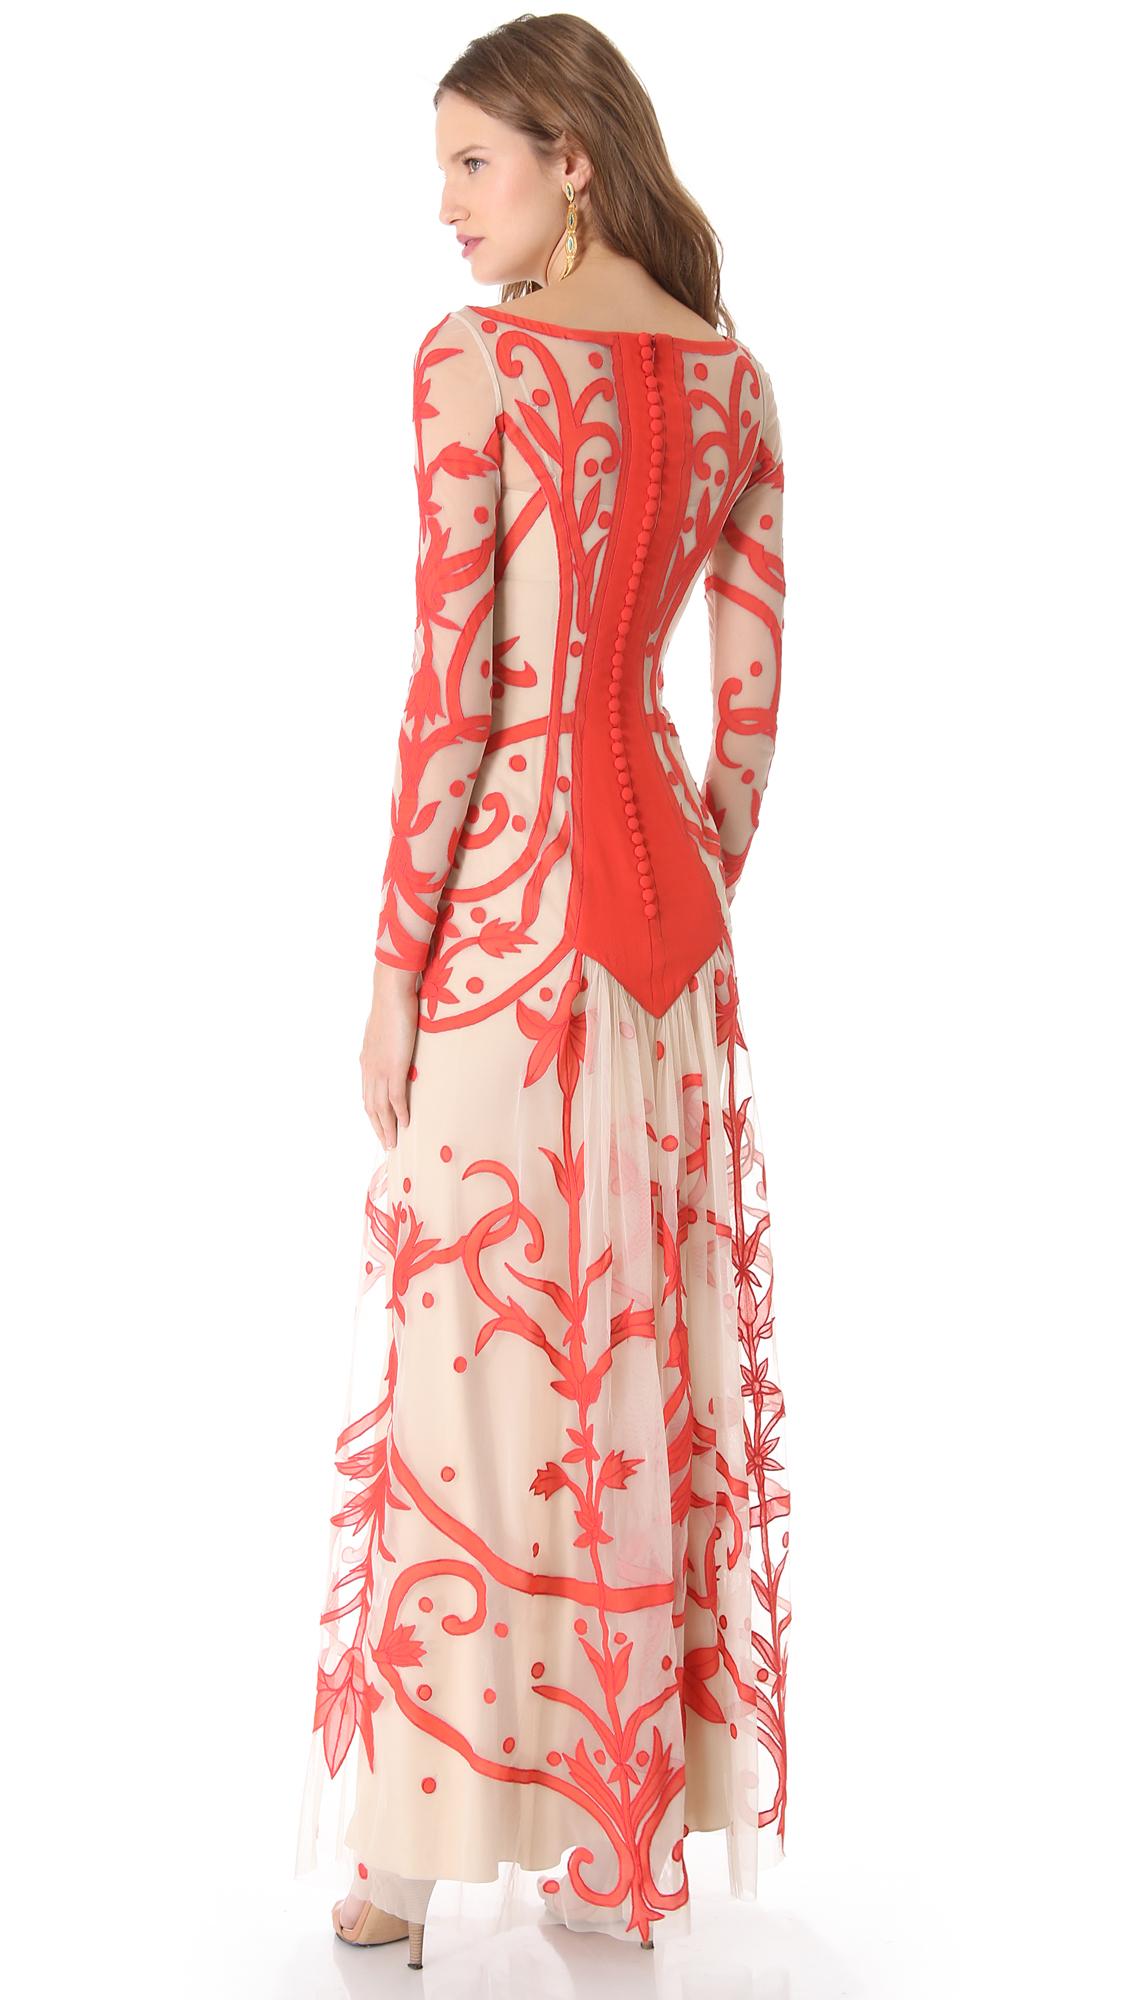 Temperley london long francine tattoo dress